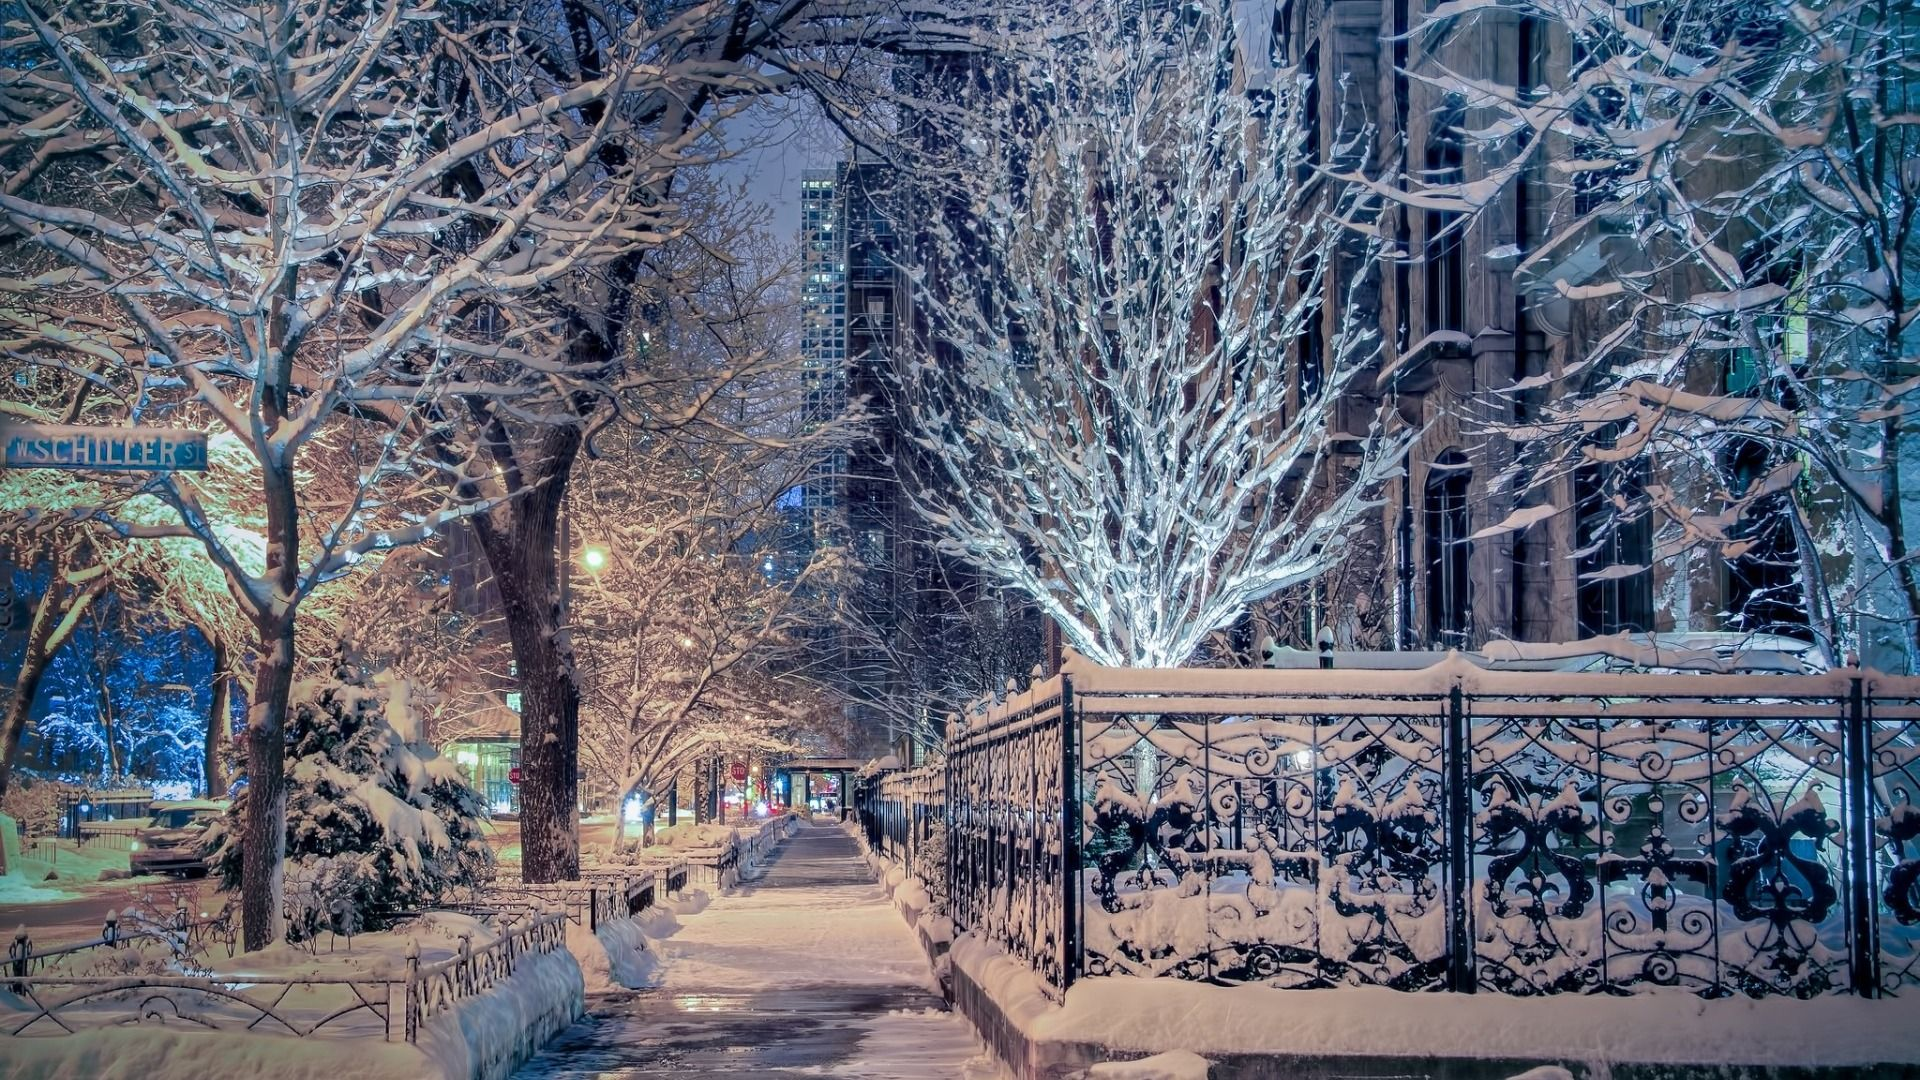 Download wallpaper Il, street, Illinois, Chicago, trees